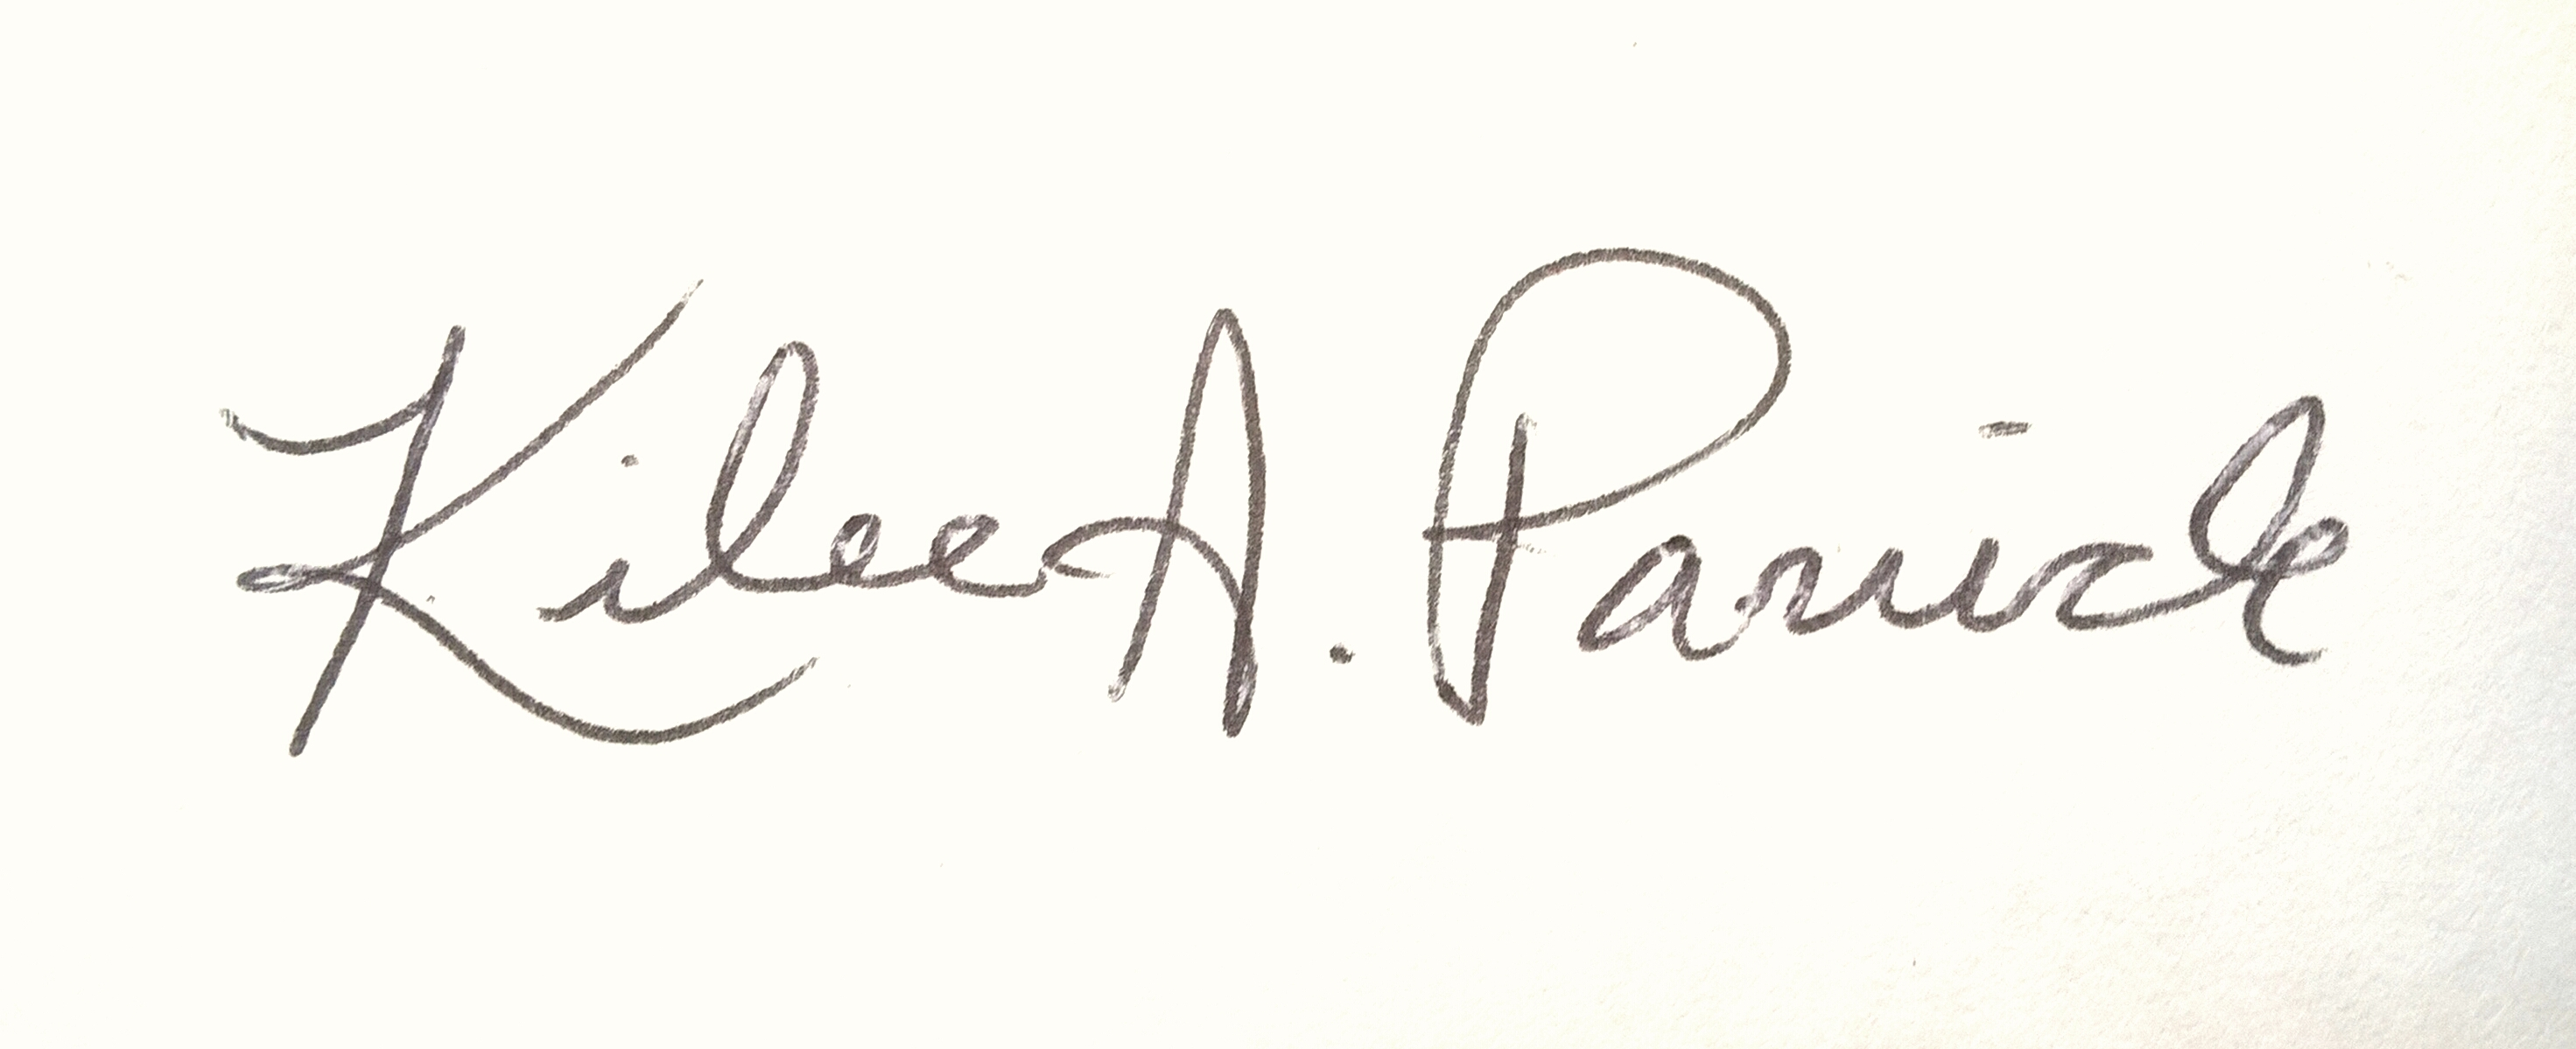 Kilee Panick's Signature